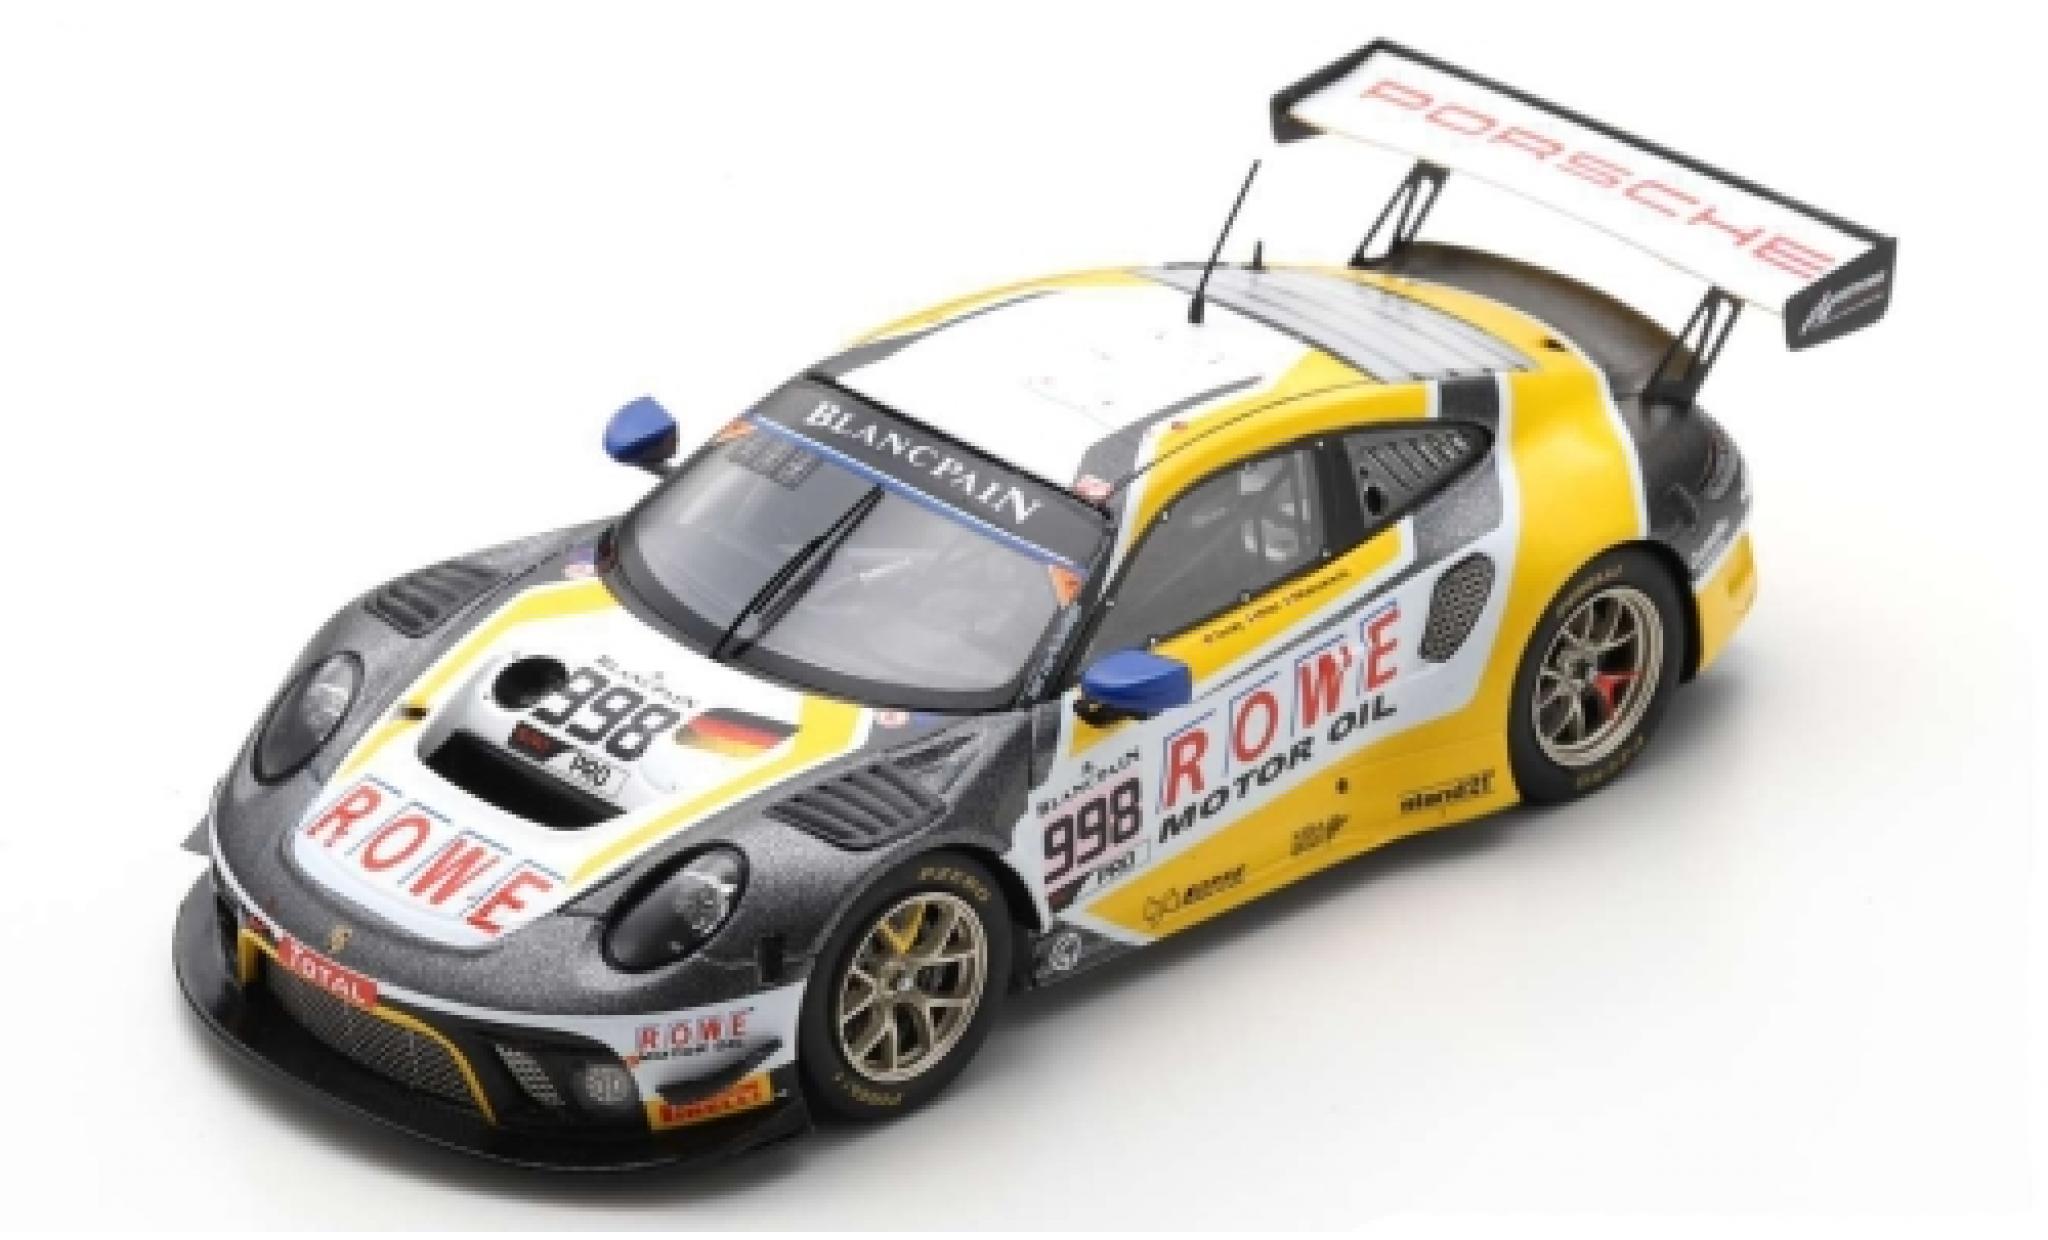 Porsche 992 GT3 R 1/43 Spark 911 (991) No.998 ROWE Racing 24h Spa 2019 F.Makowiecki/P.Pilet/N.Tandy